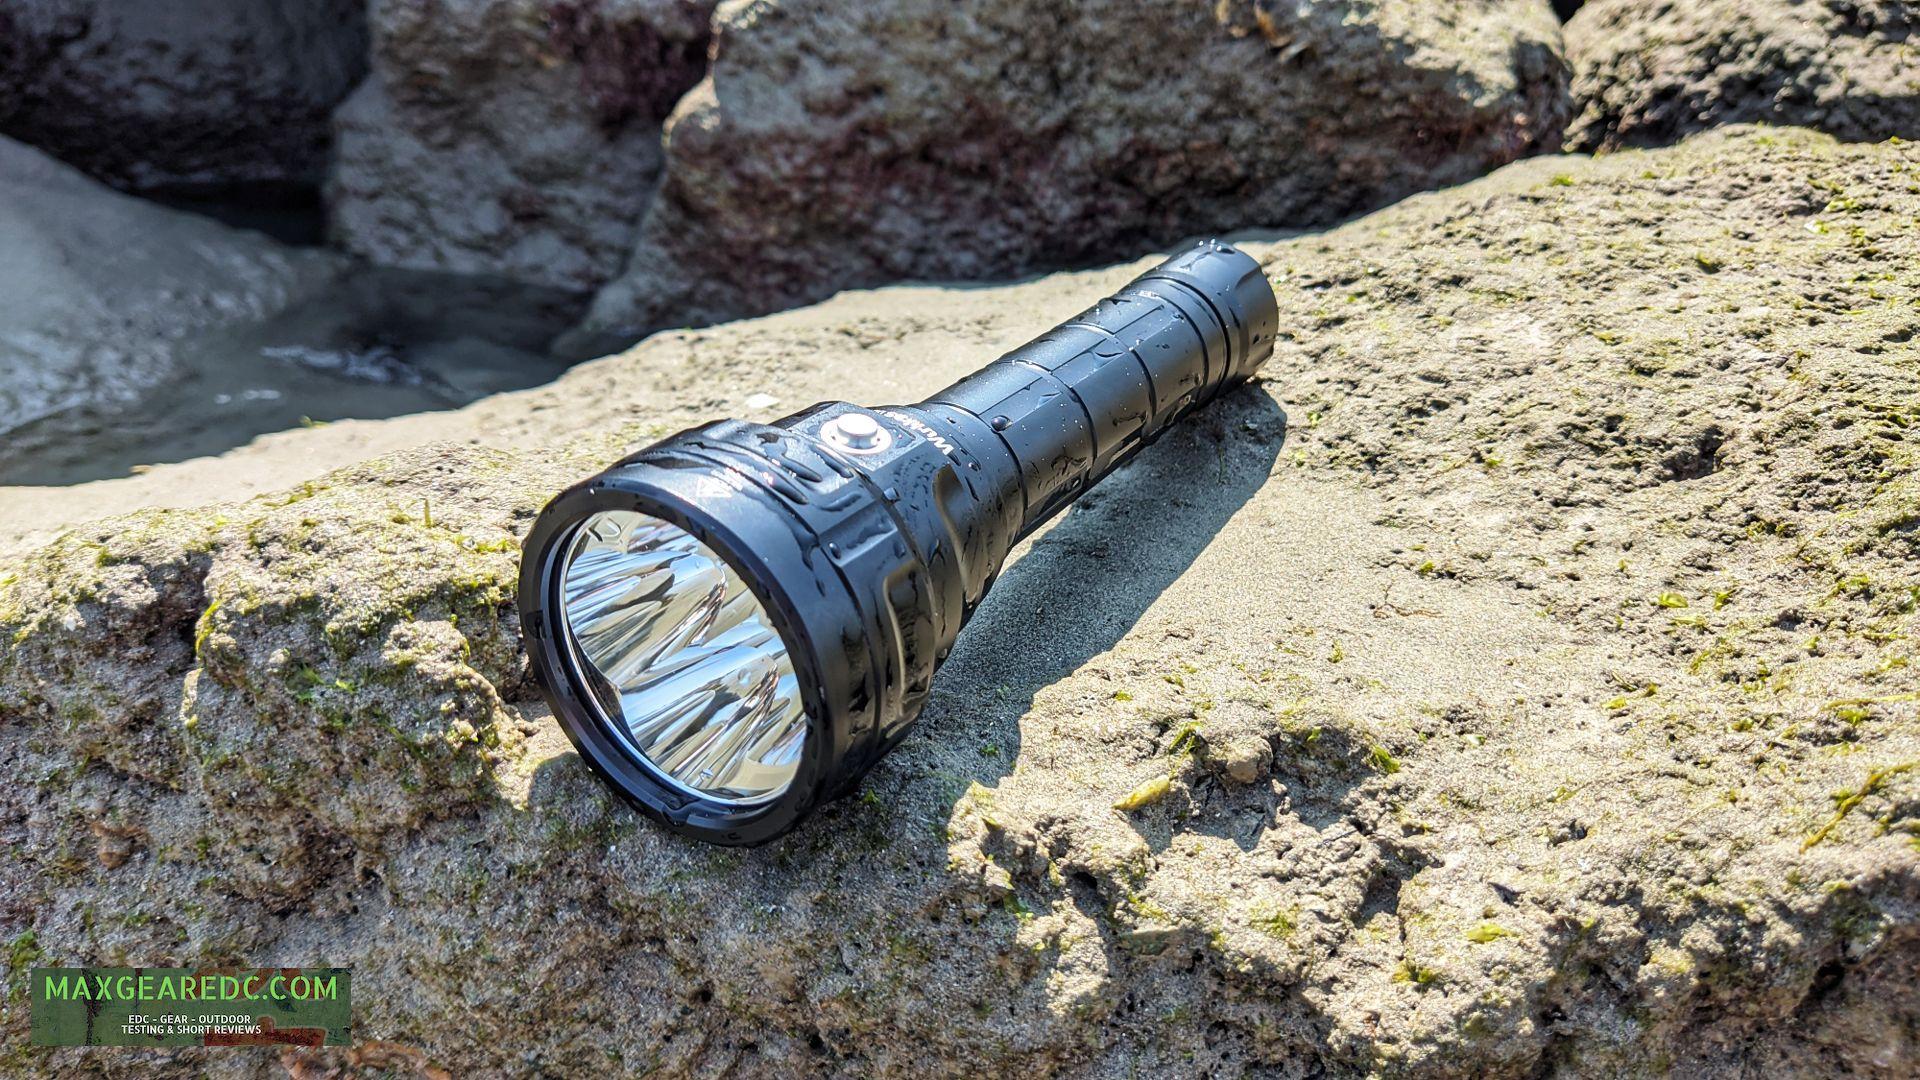 Wurkkos_DL40_Diving_Flashlight_Review_Aluminium_26650_maxgearedc.com_EDC_GEAR_OUTDOOR_TESTING_and_SHORT_REVIEWS_17